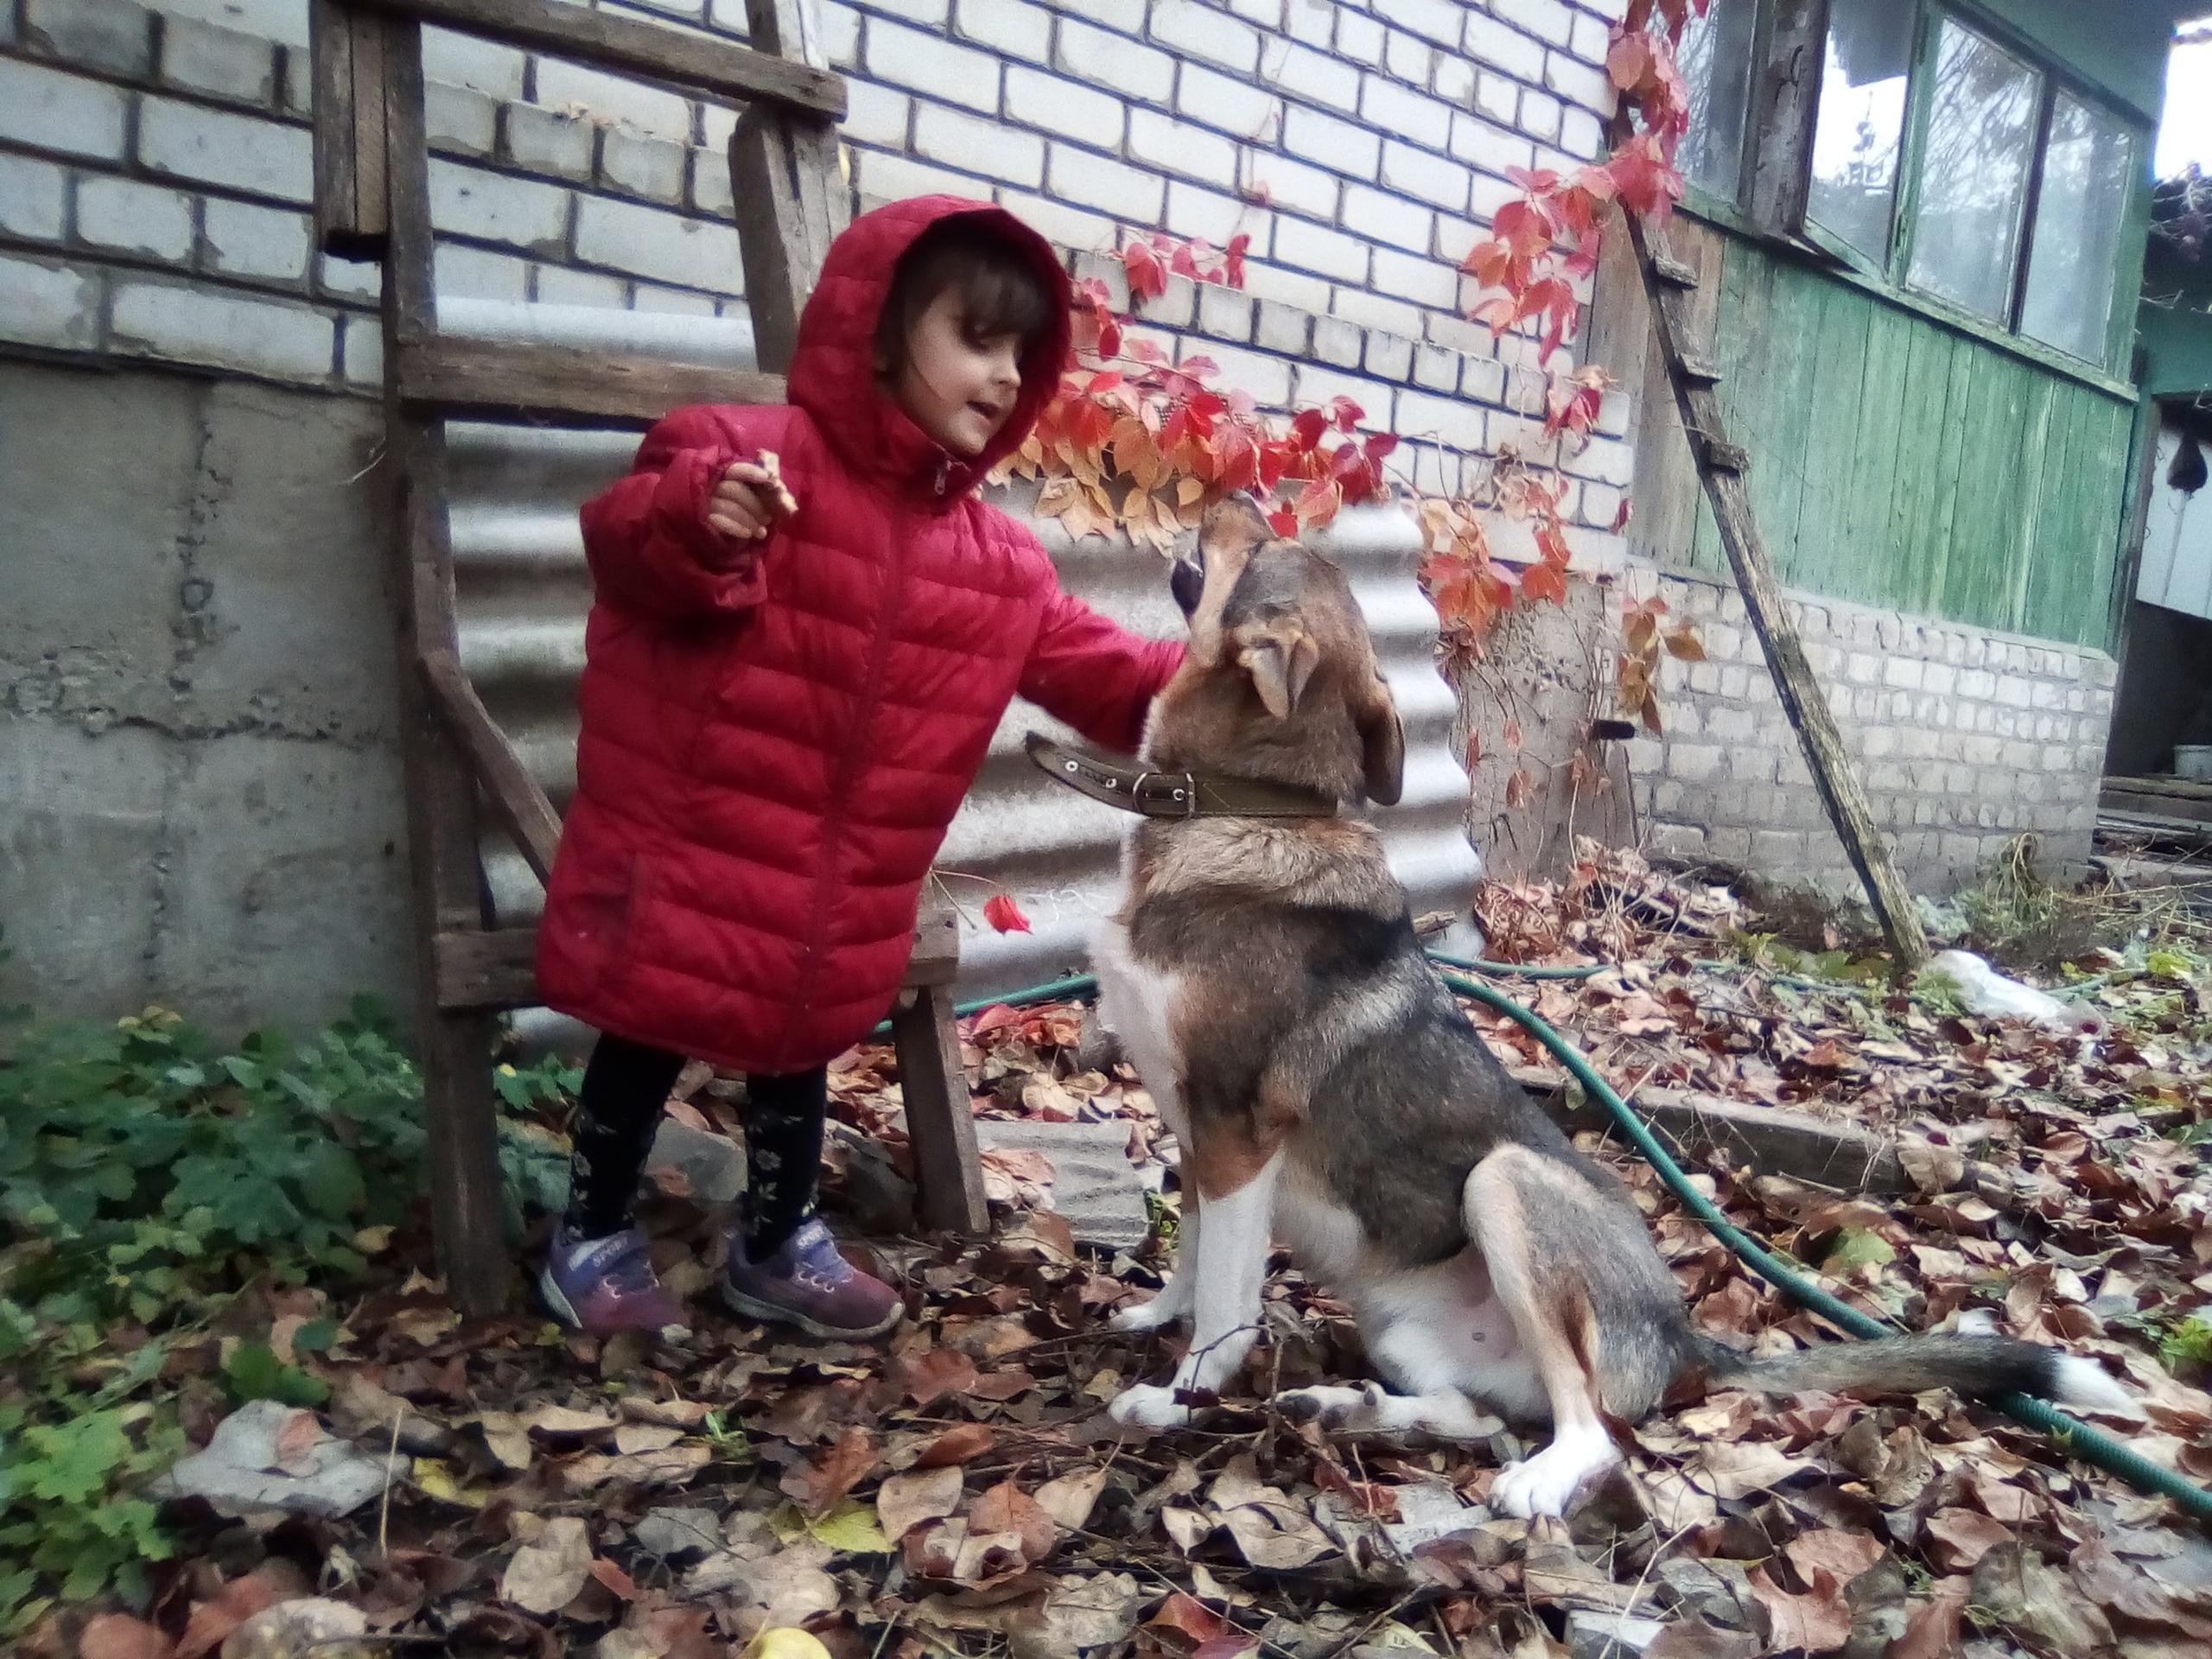 пес и девочка